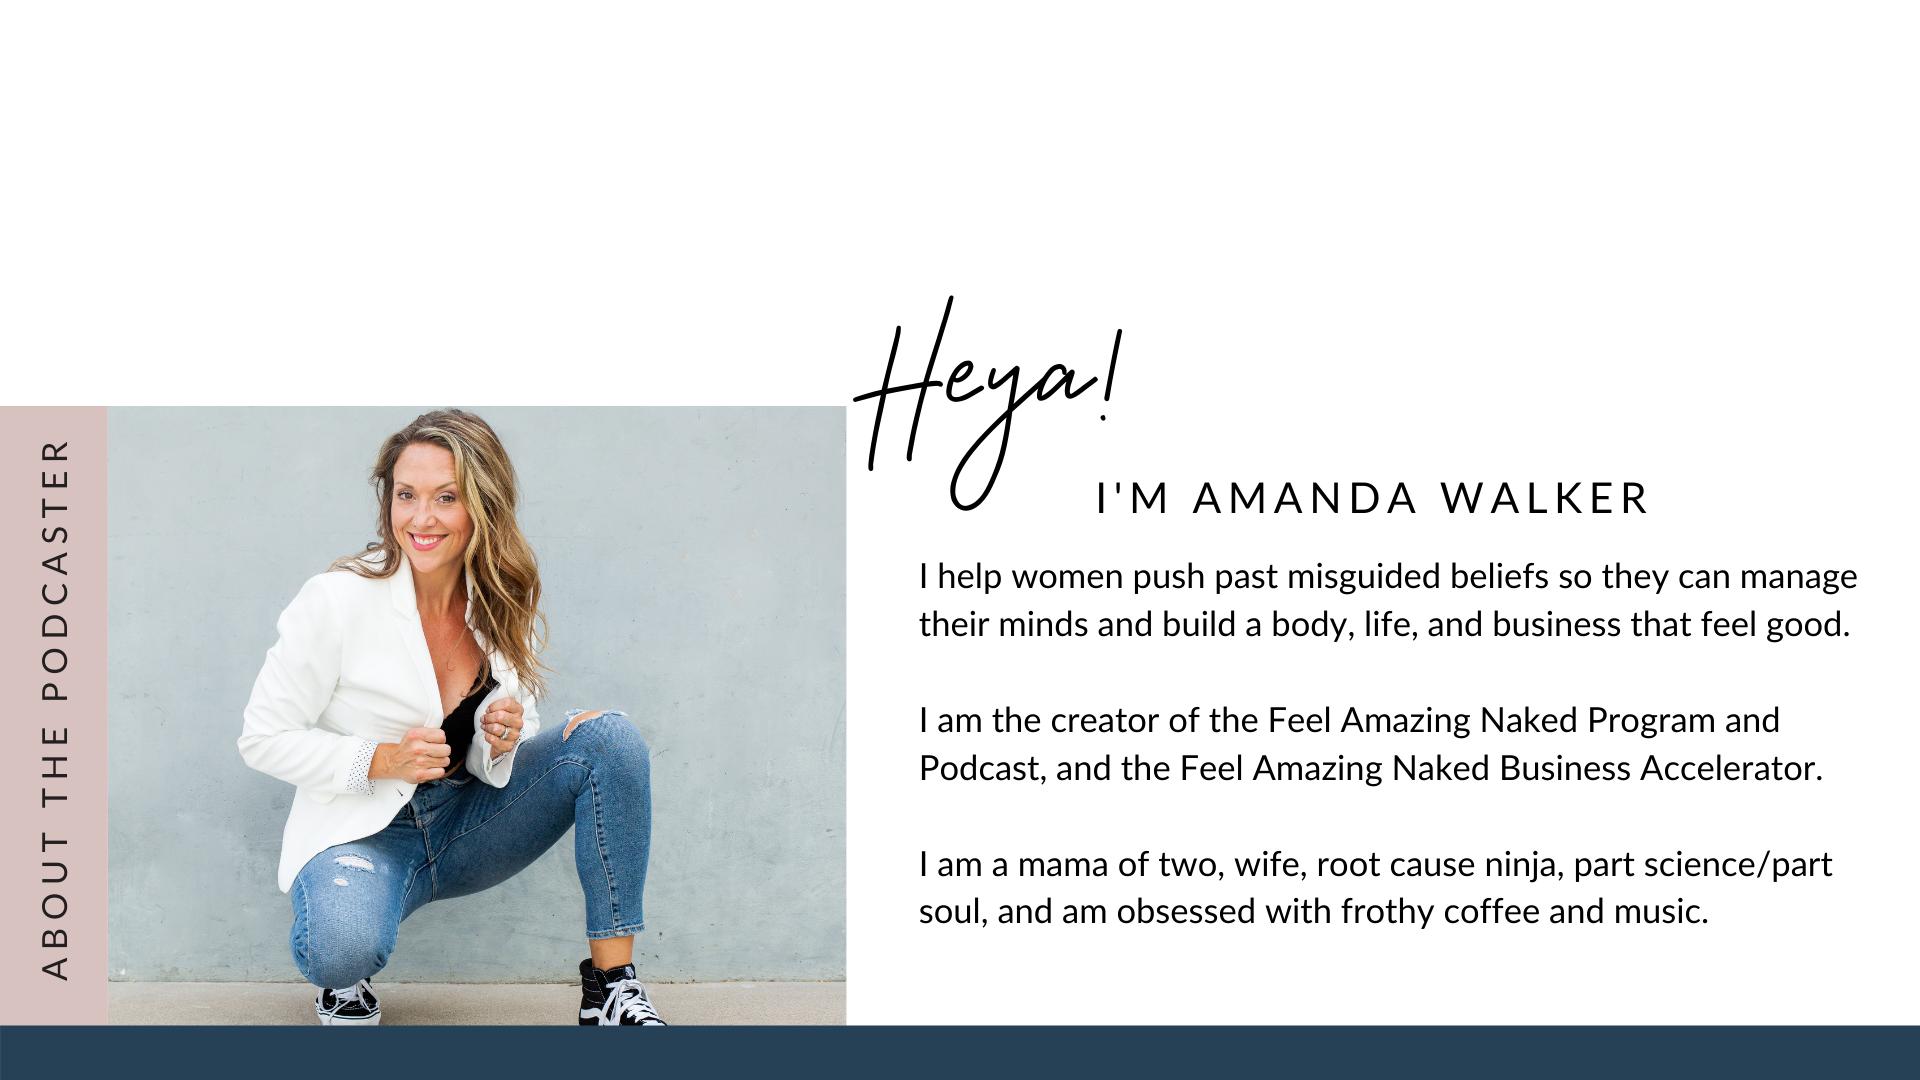 amanda walker business life health coach